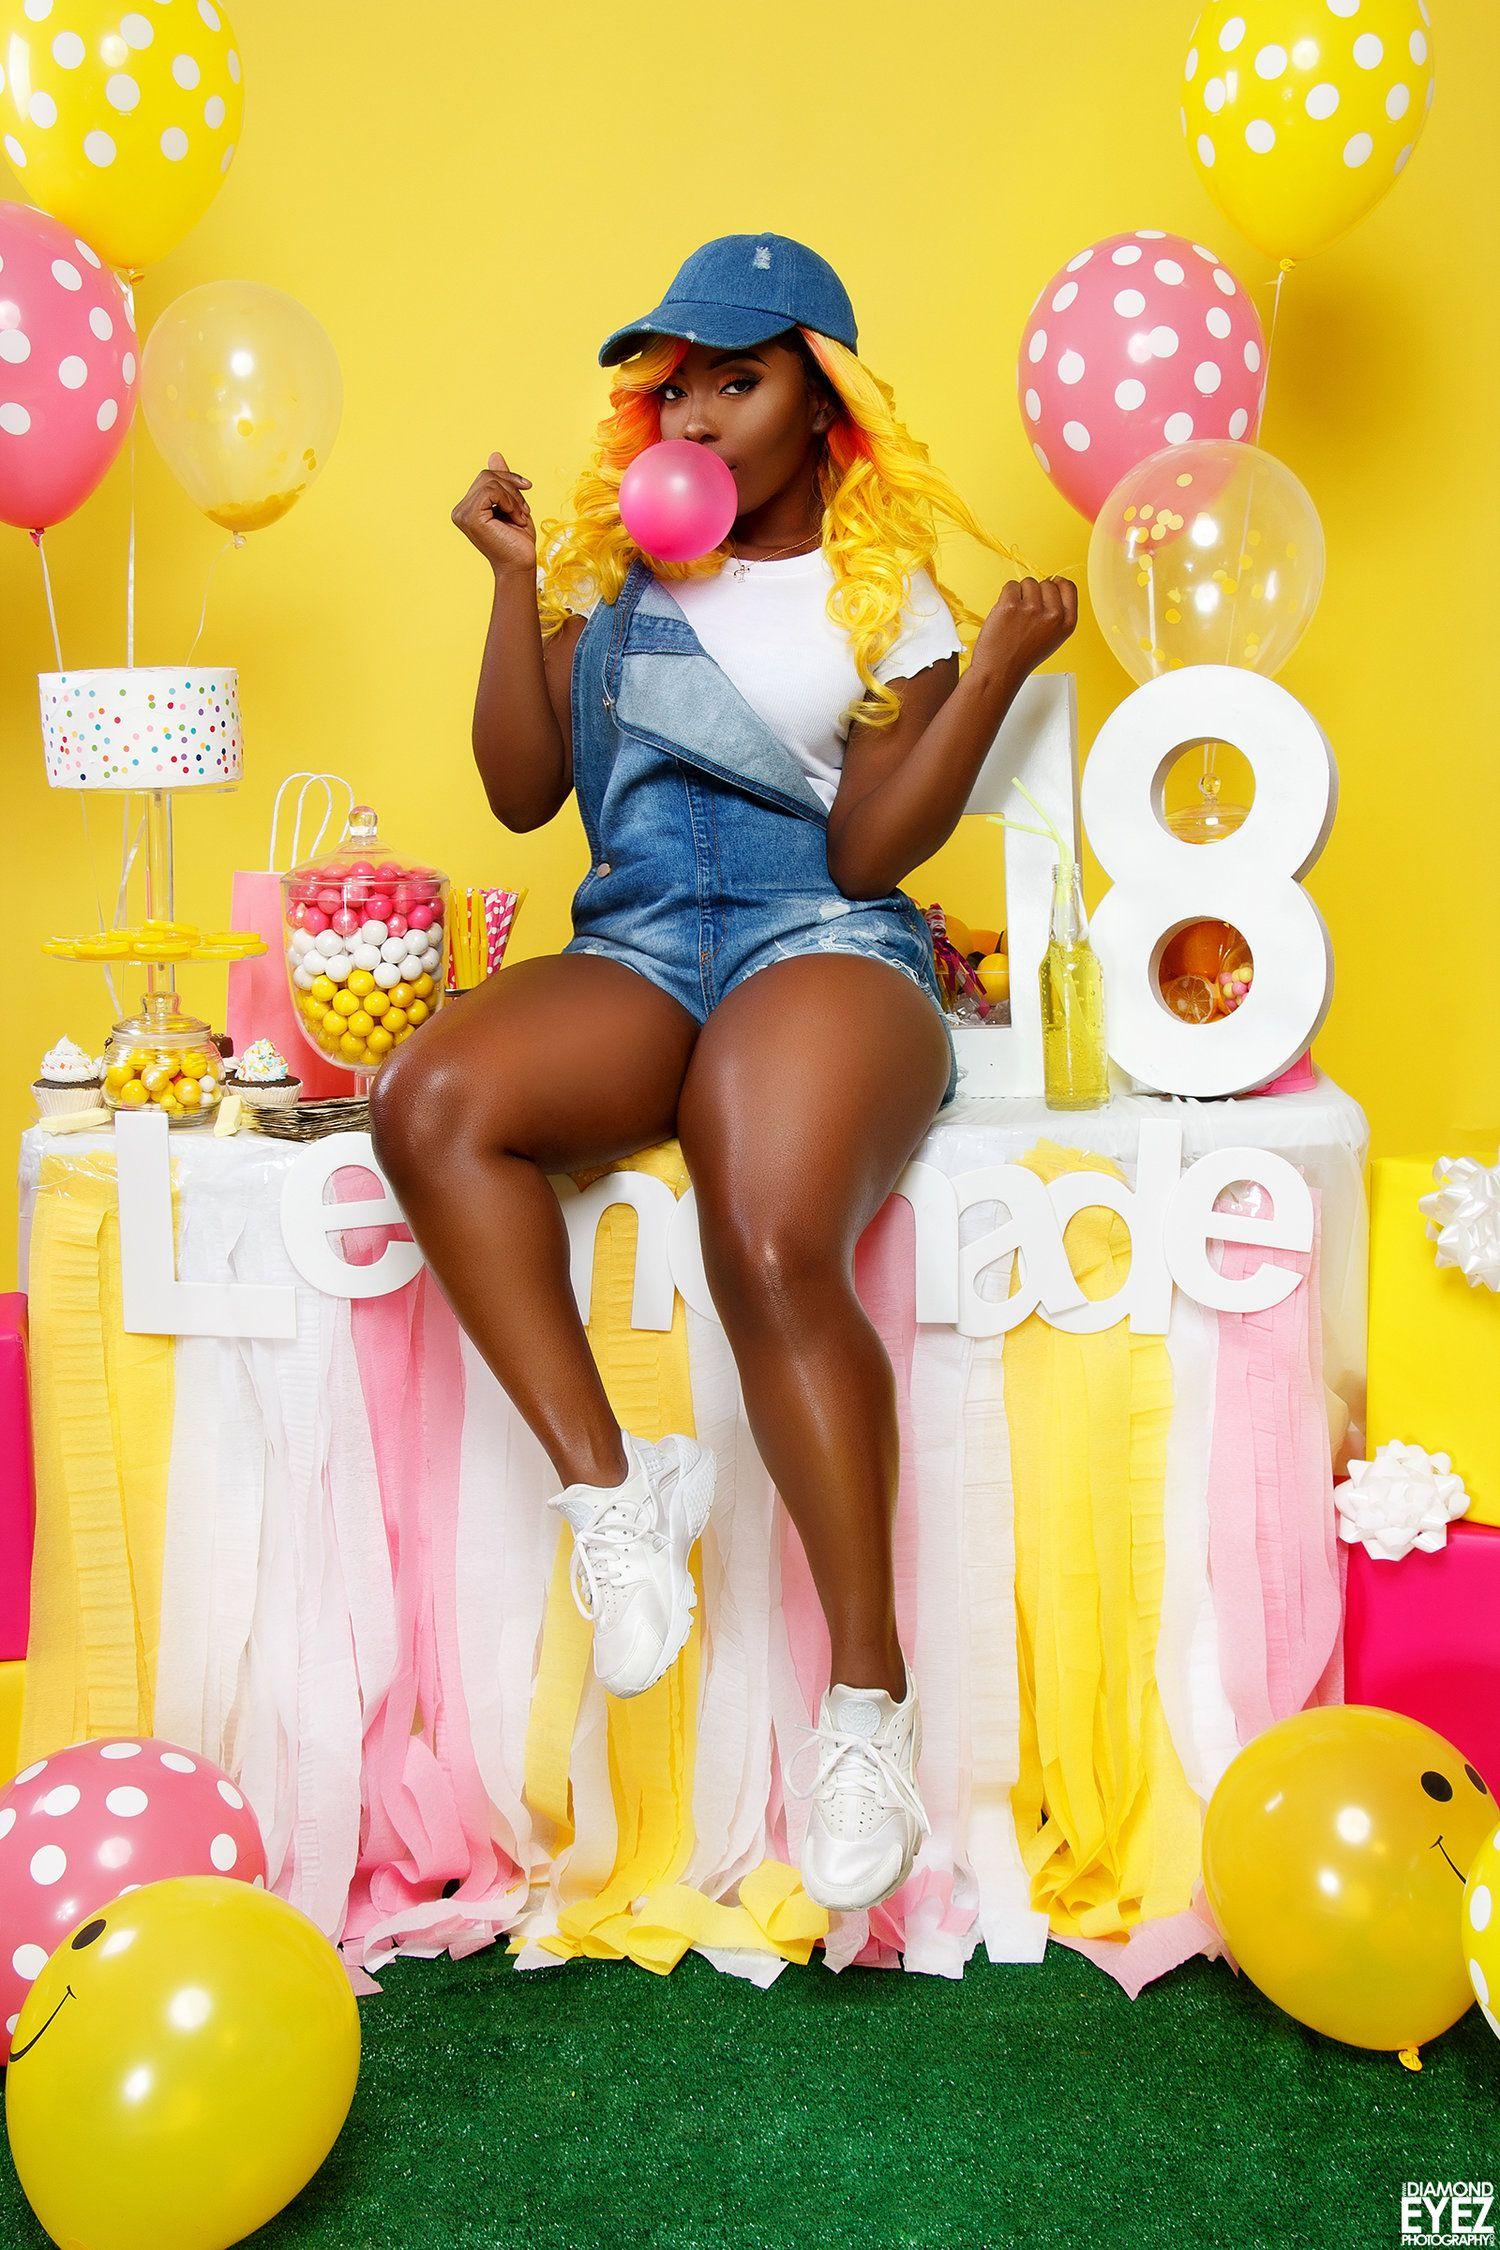 Pin by 𝐕𝐄𝐑𝐀𝐂𝐄𝐃𝐑𝐀𝐂𝐎🧚🏾♀️ on Birthday 21st birthday